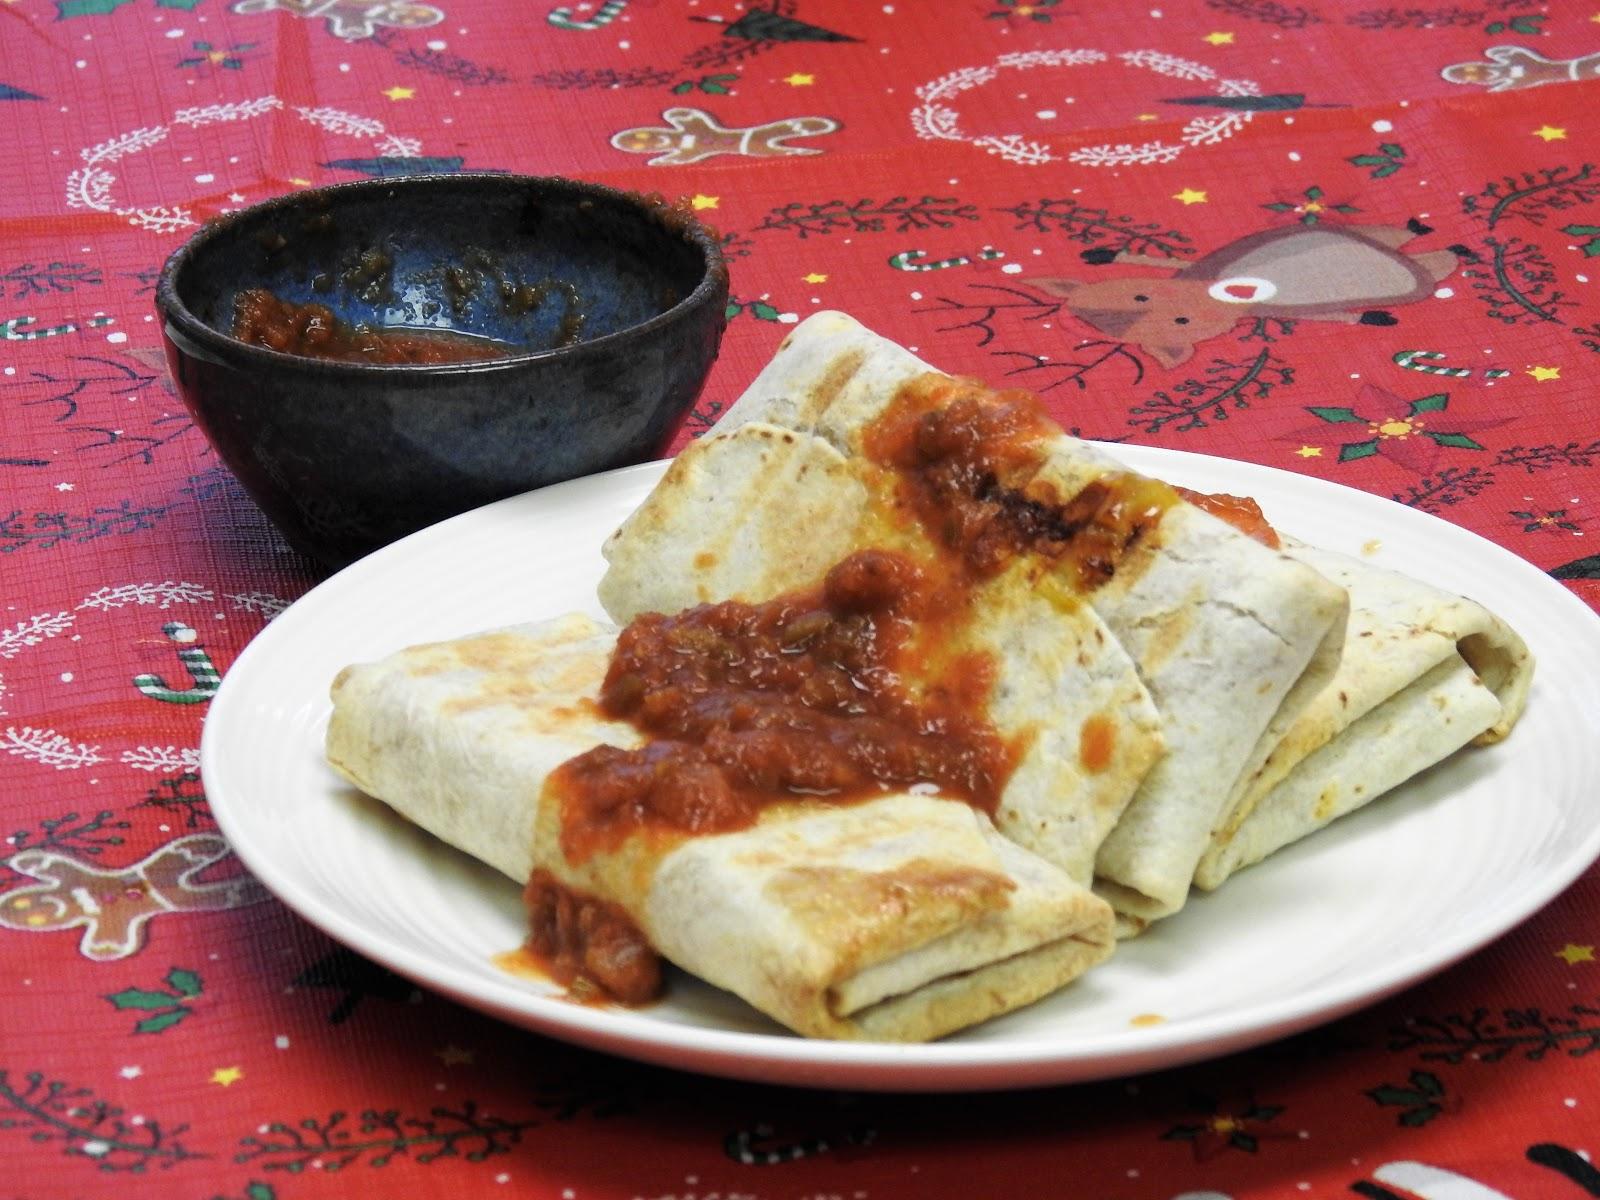 yummy alpha burrito